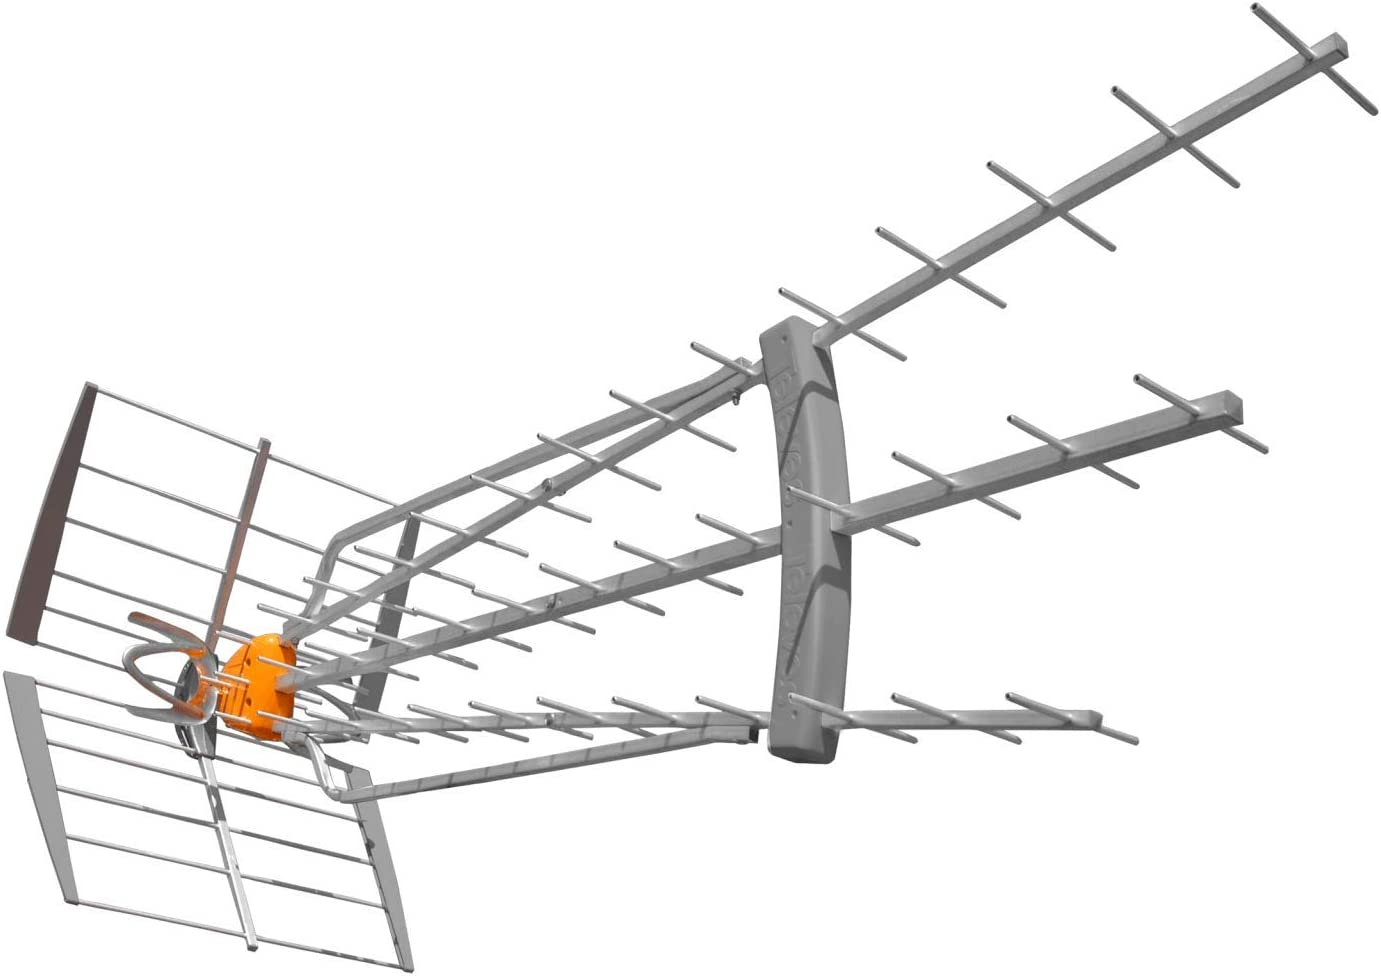 Antena TDT-UHF 47dB DAT Boss LR LTE 5G Televes: Amazon.es ...